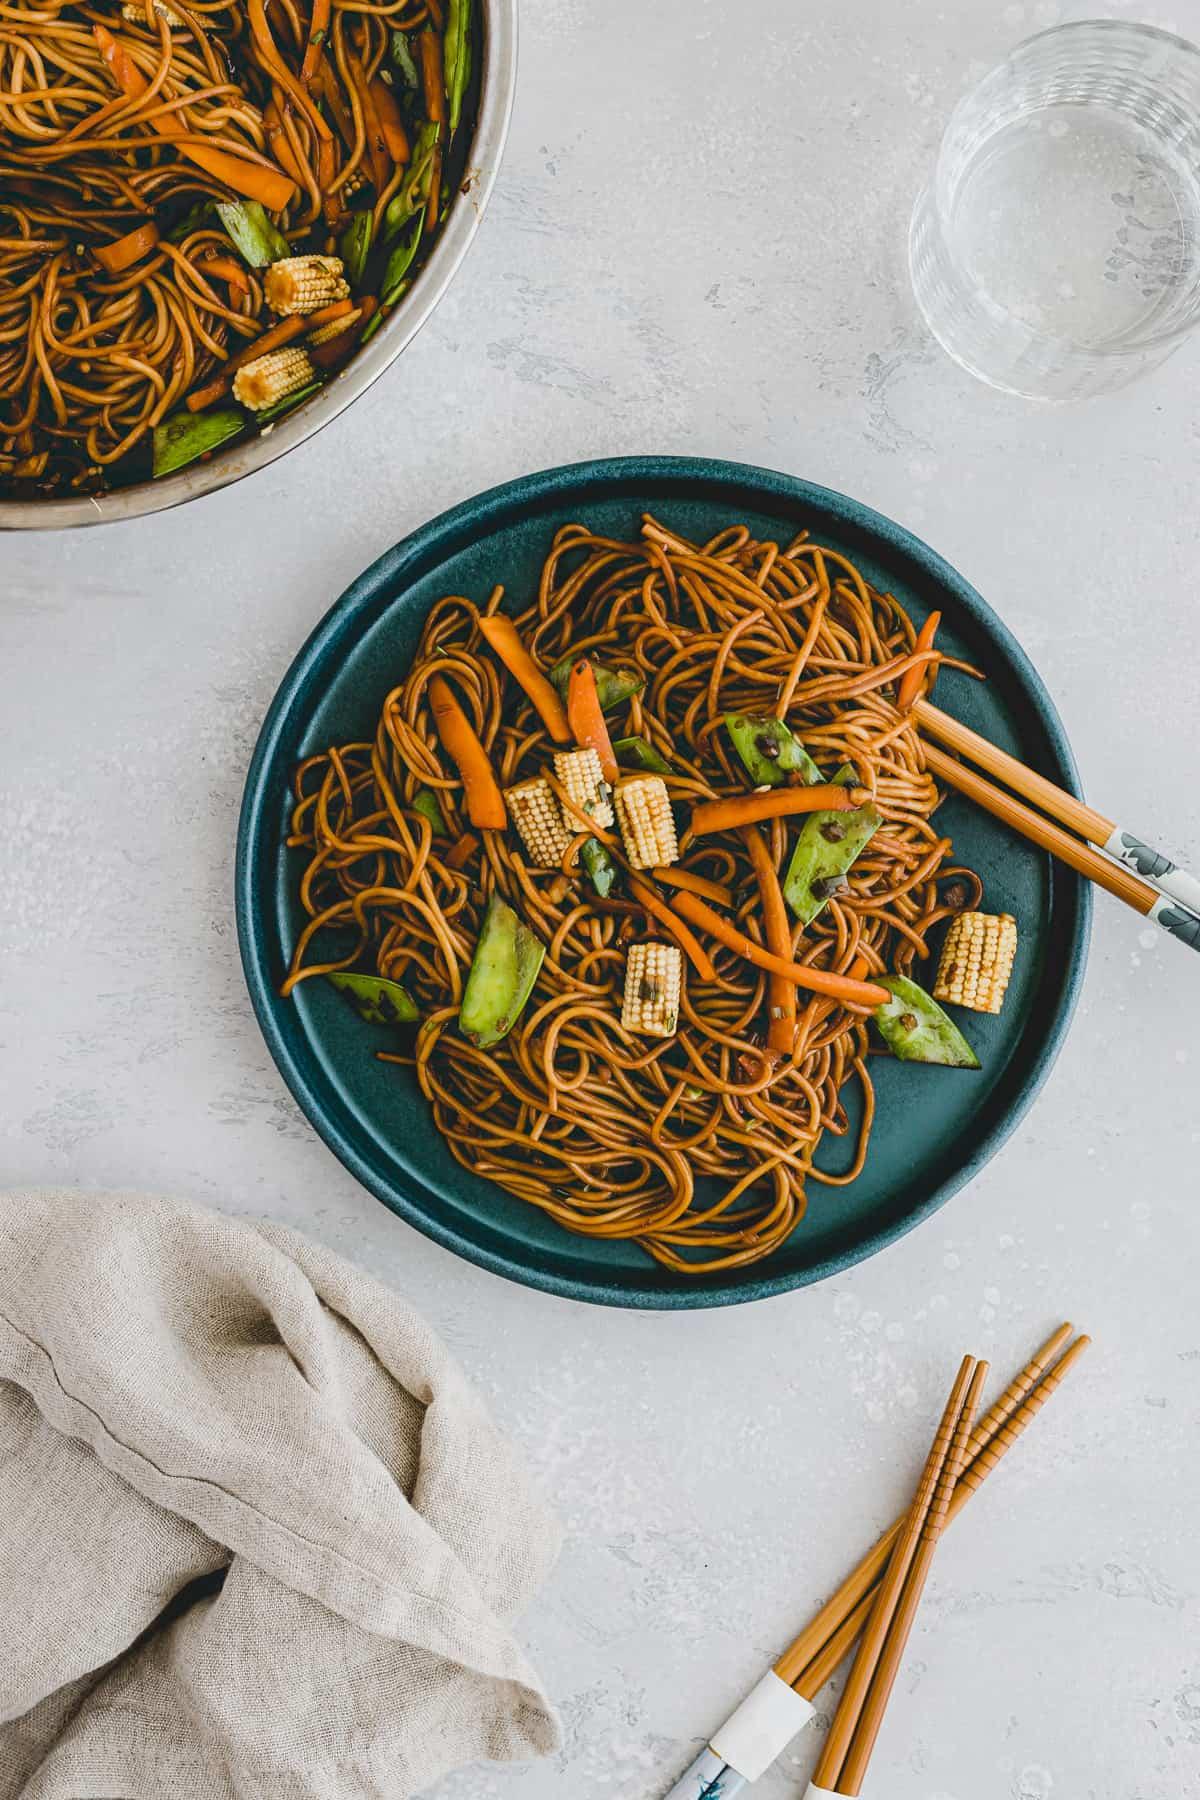 lo mein noodles on a blue plate